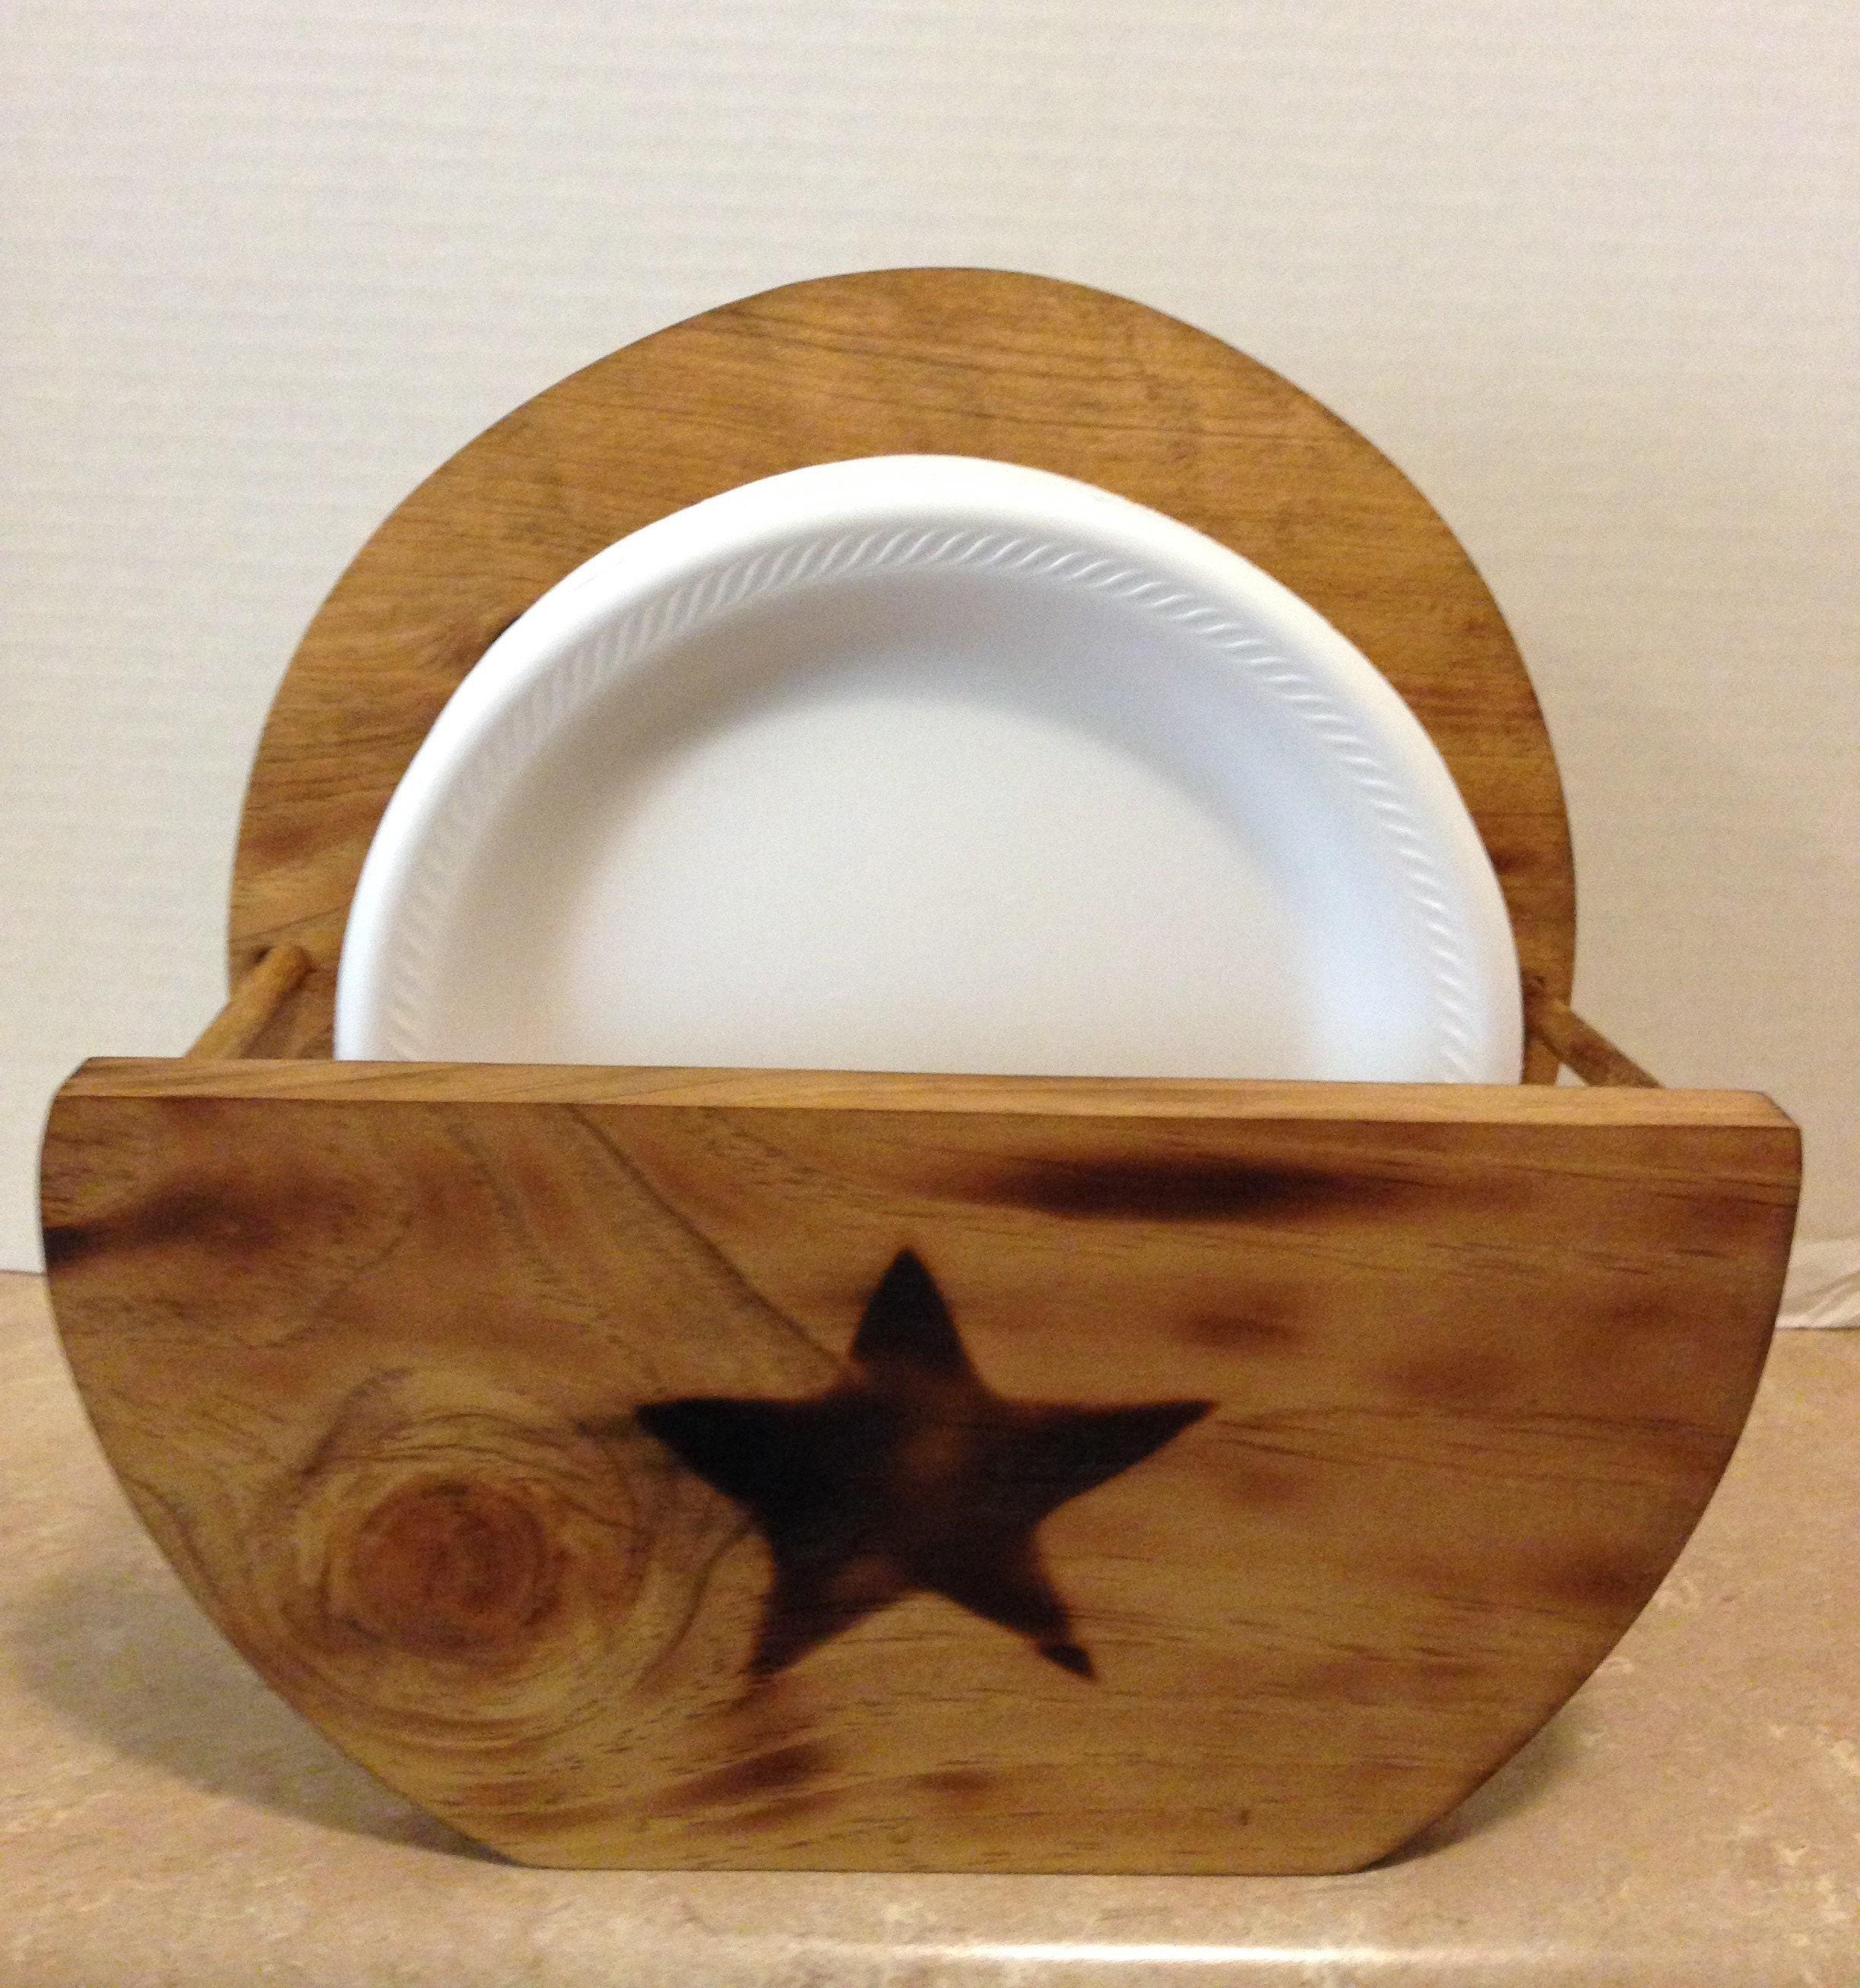 Paper Plate Holder Wooden Plate Holder Holder for plates Primitive Decor Rustic Decor Rustic Kitchen Primitive Kitchen Primitive star & Paper Plate Holder Wooden Plate Holder Holder for plates ...